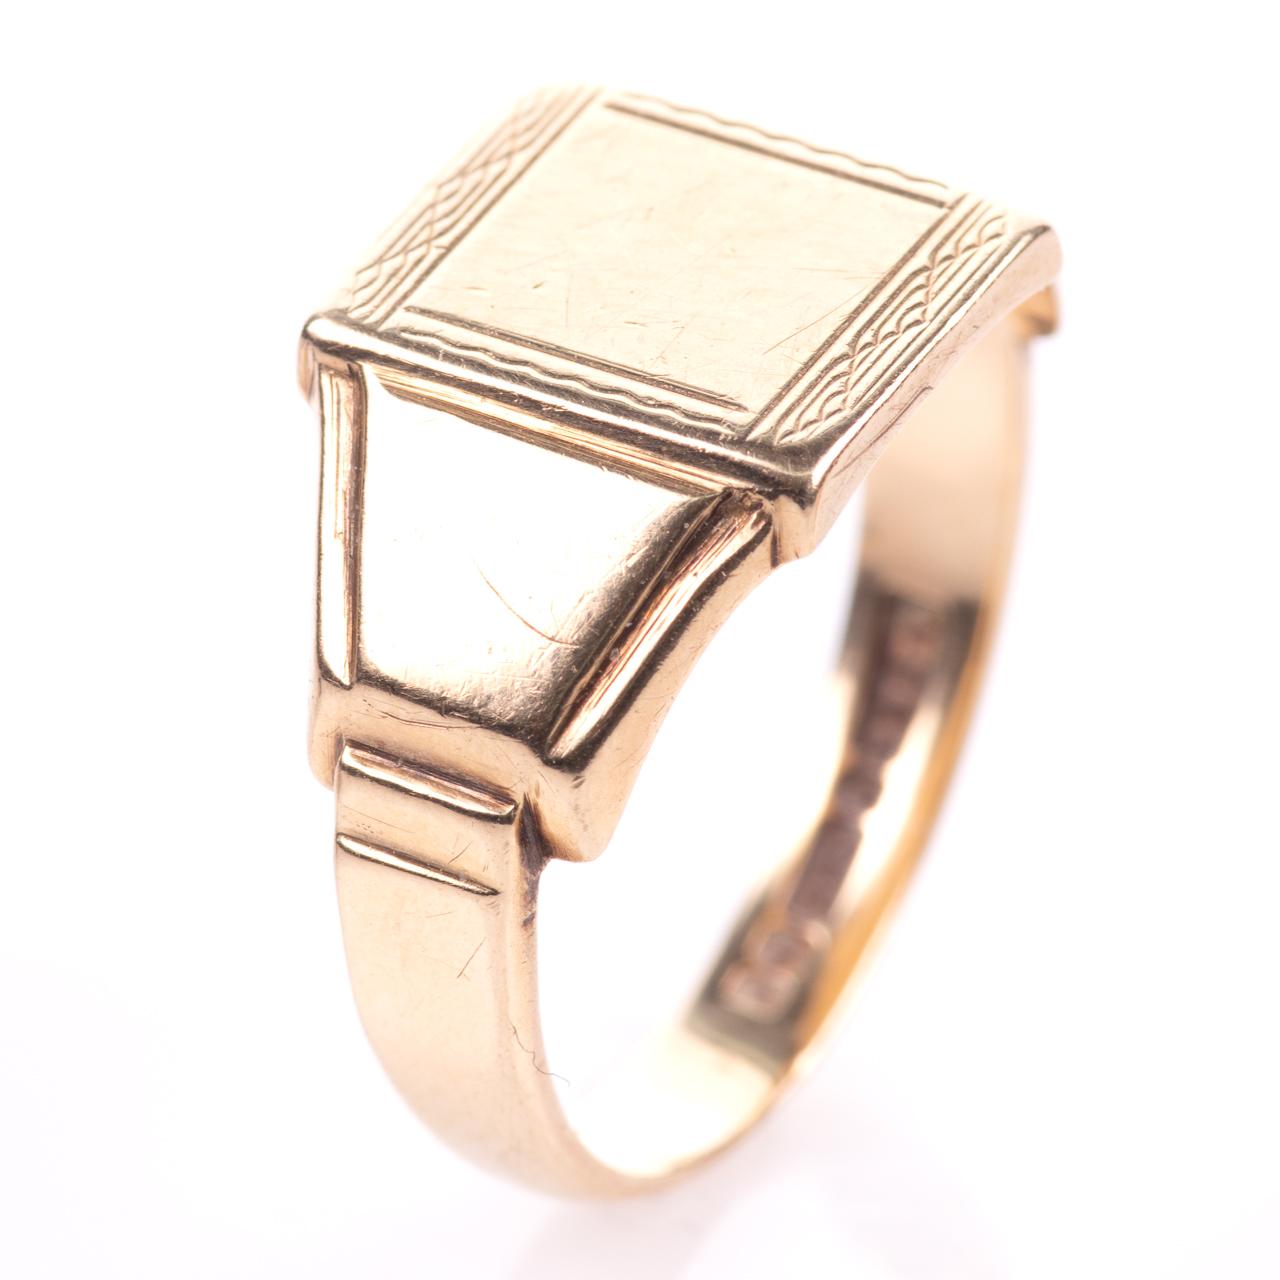 Art Deco Style Gentleman's Signet Ring 9ct Gold